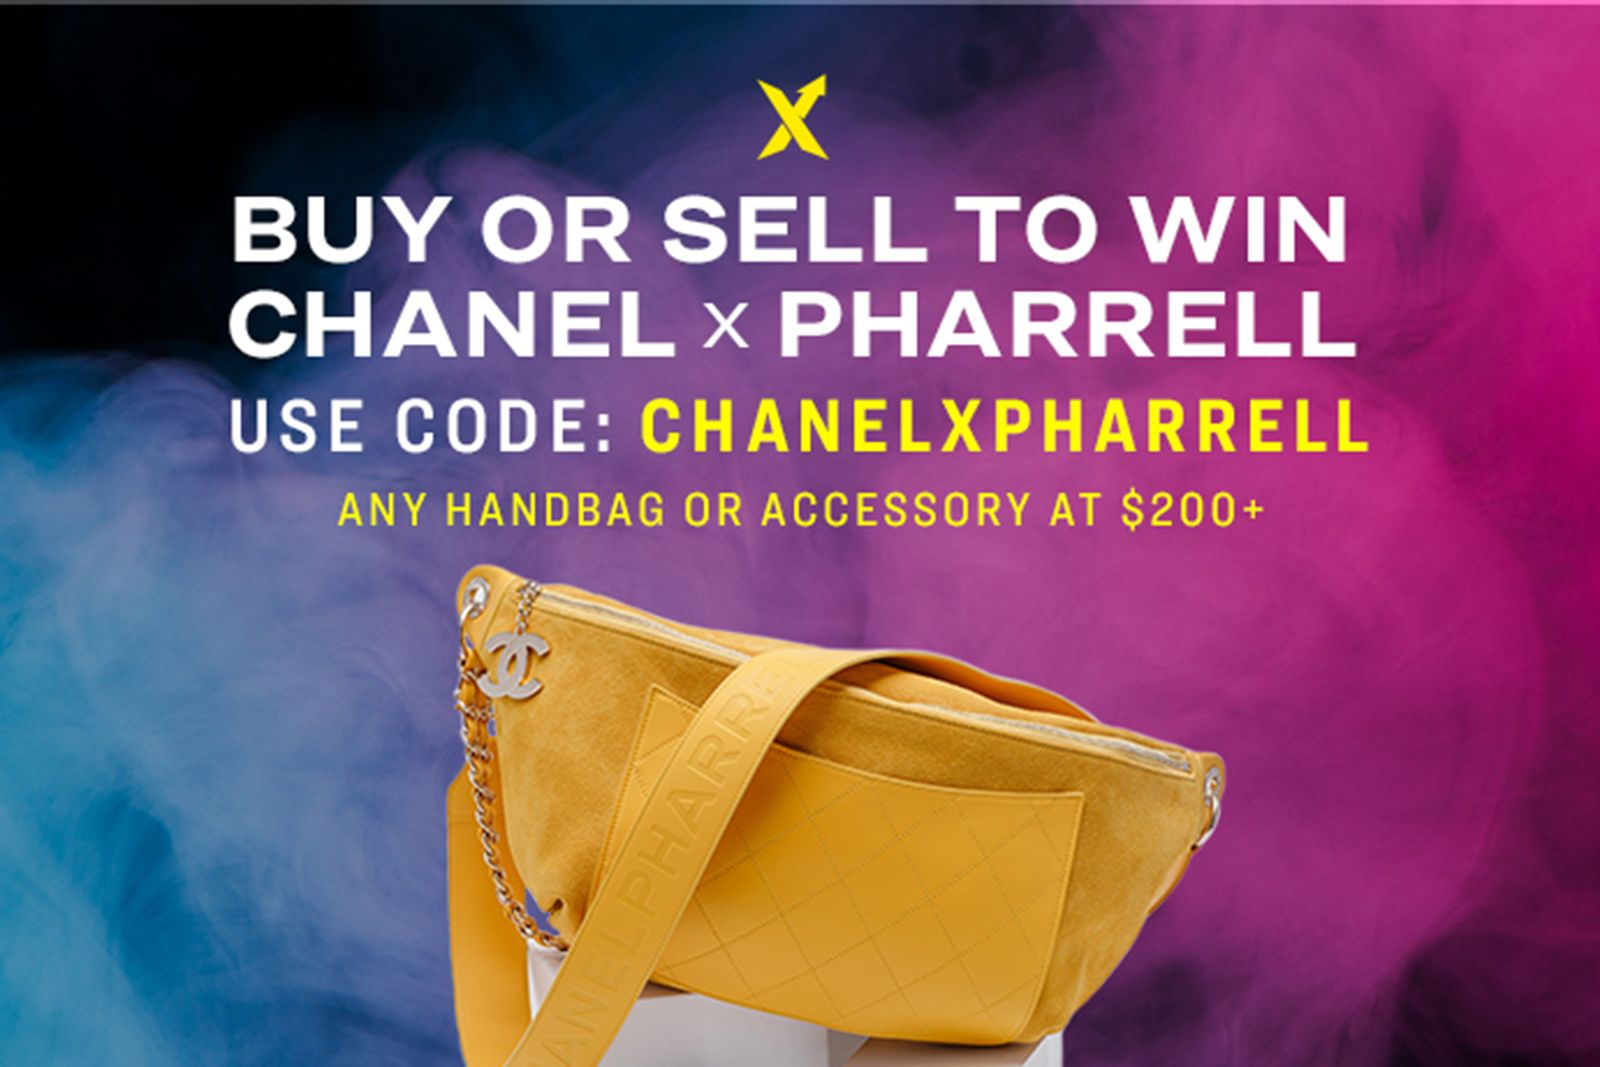 stockx pharrell chanel 002 Pharrell Williams